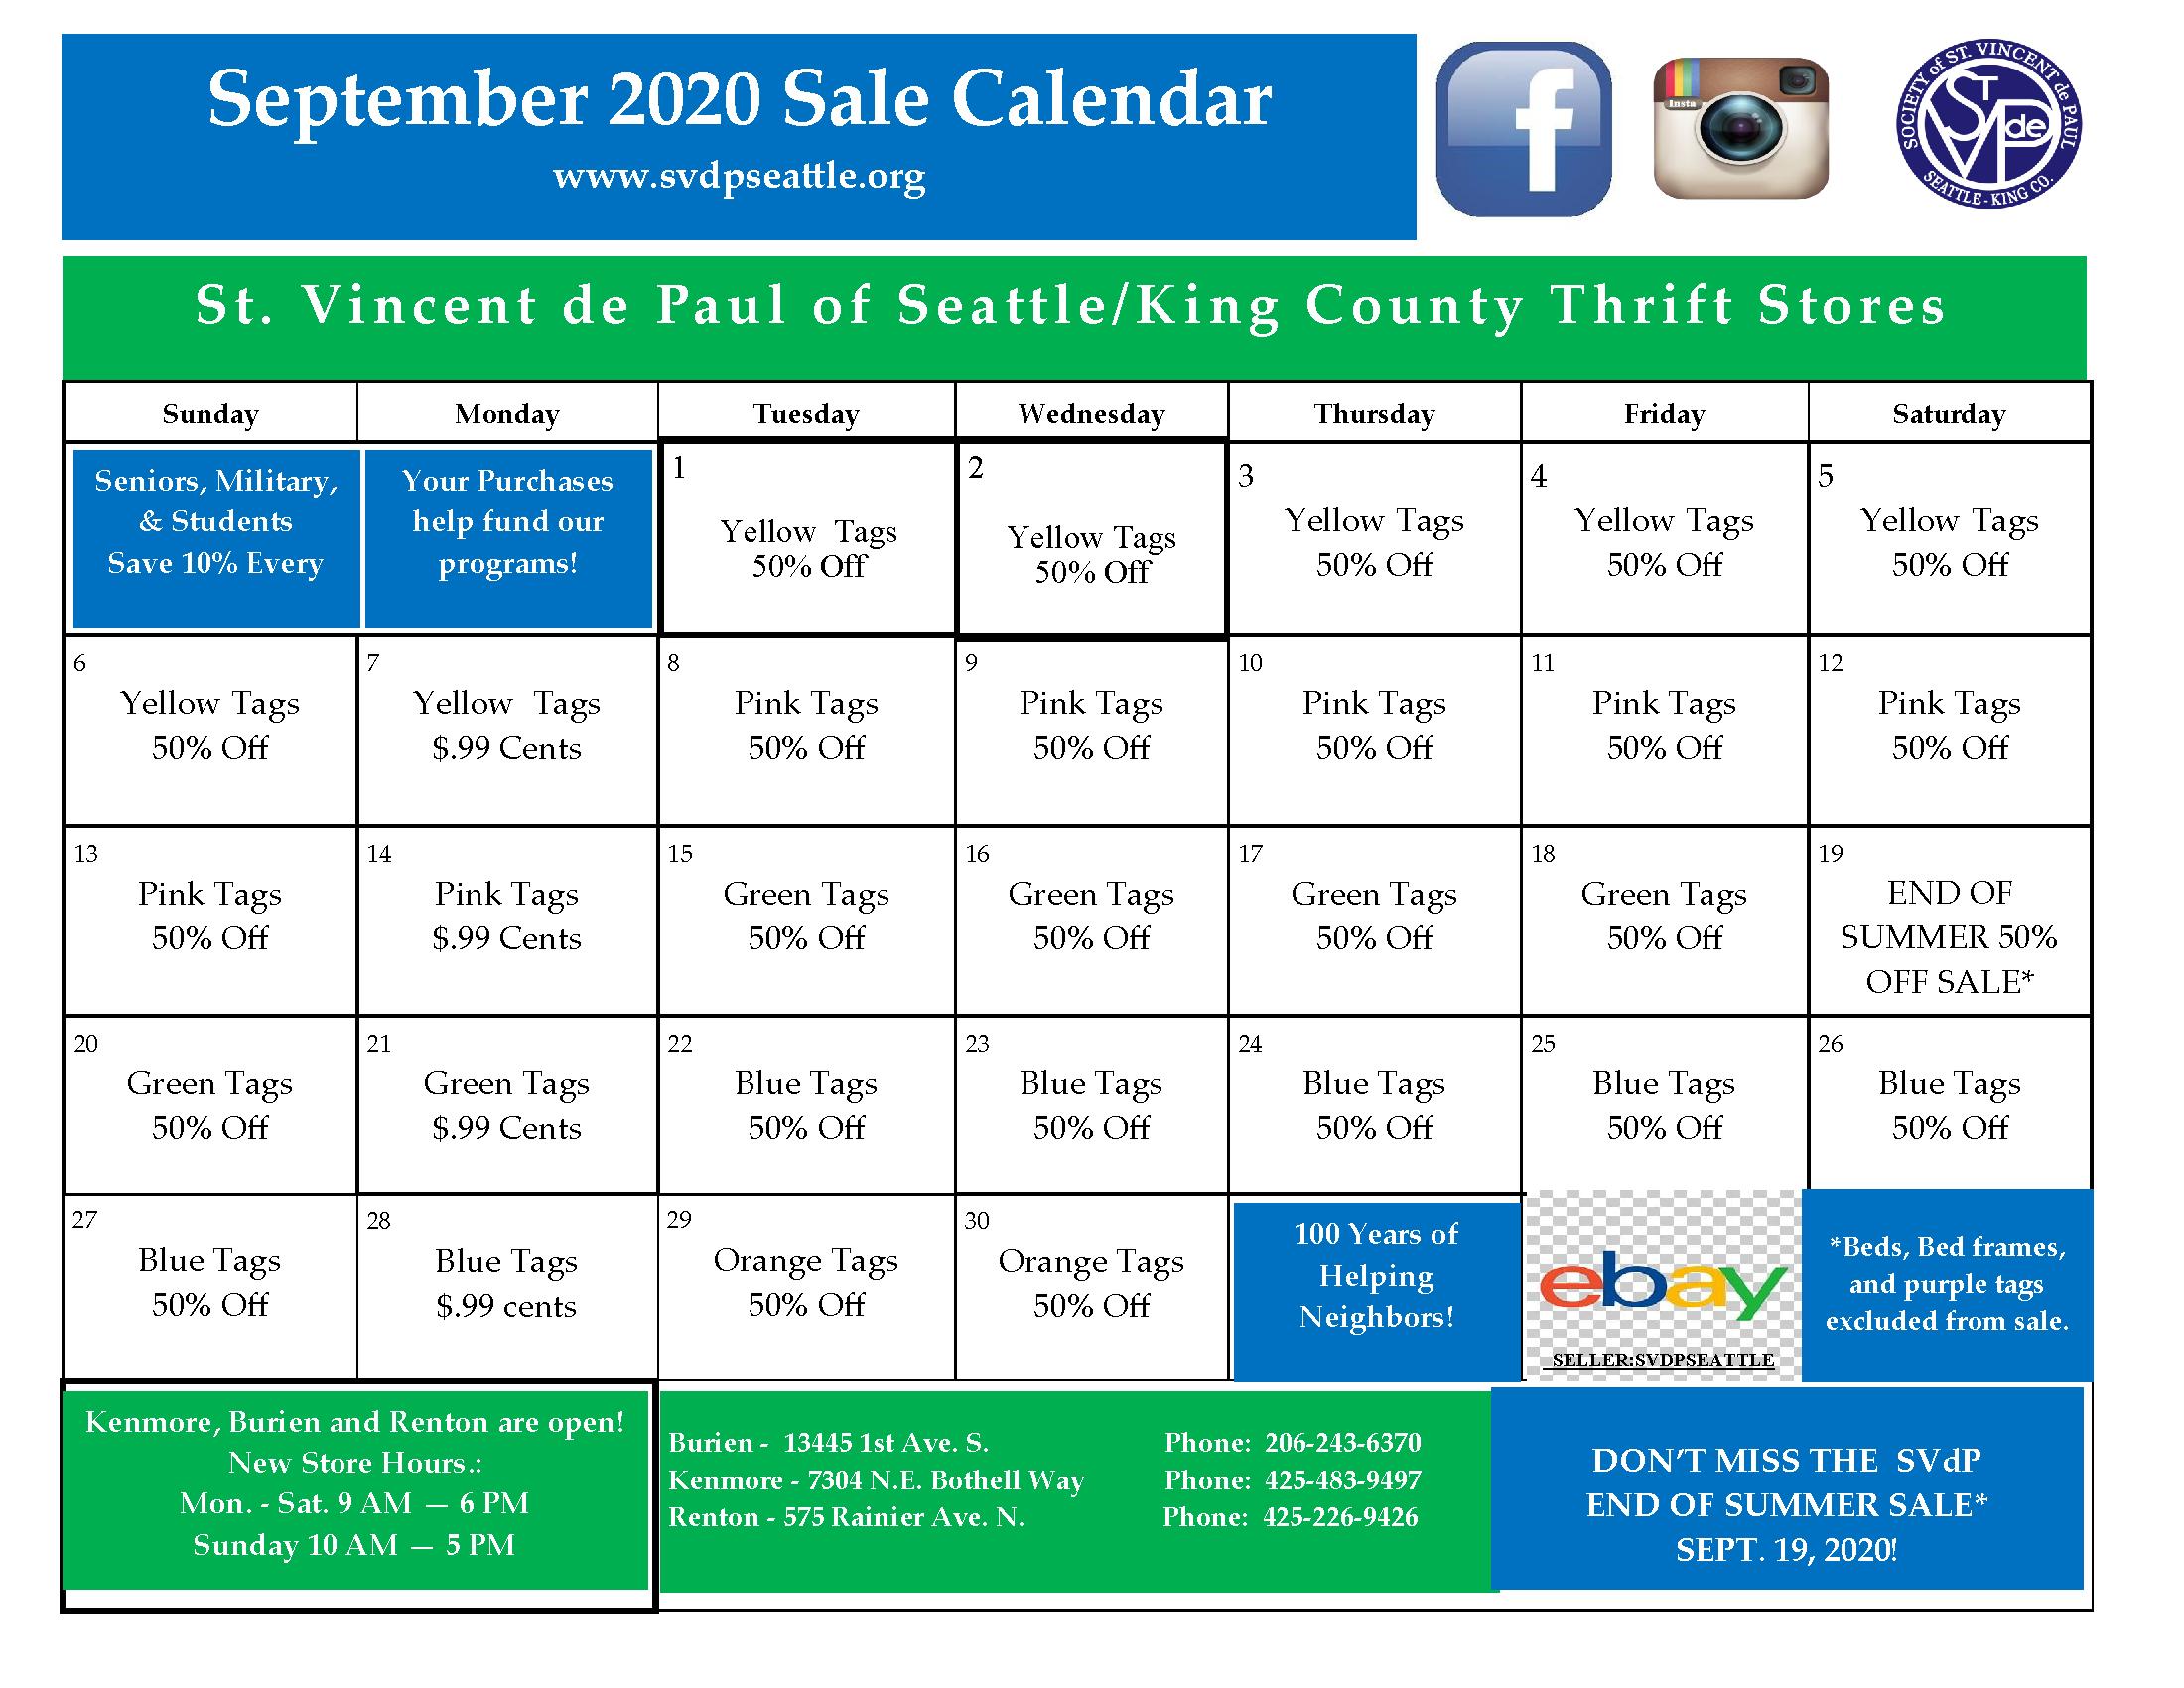 September 2020 Calendar 9-2-20